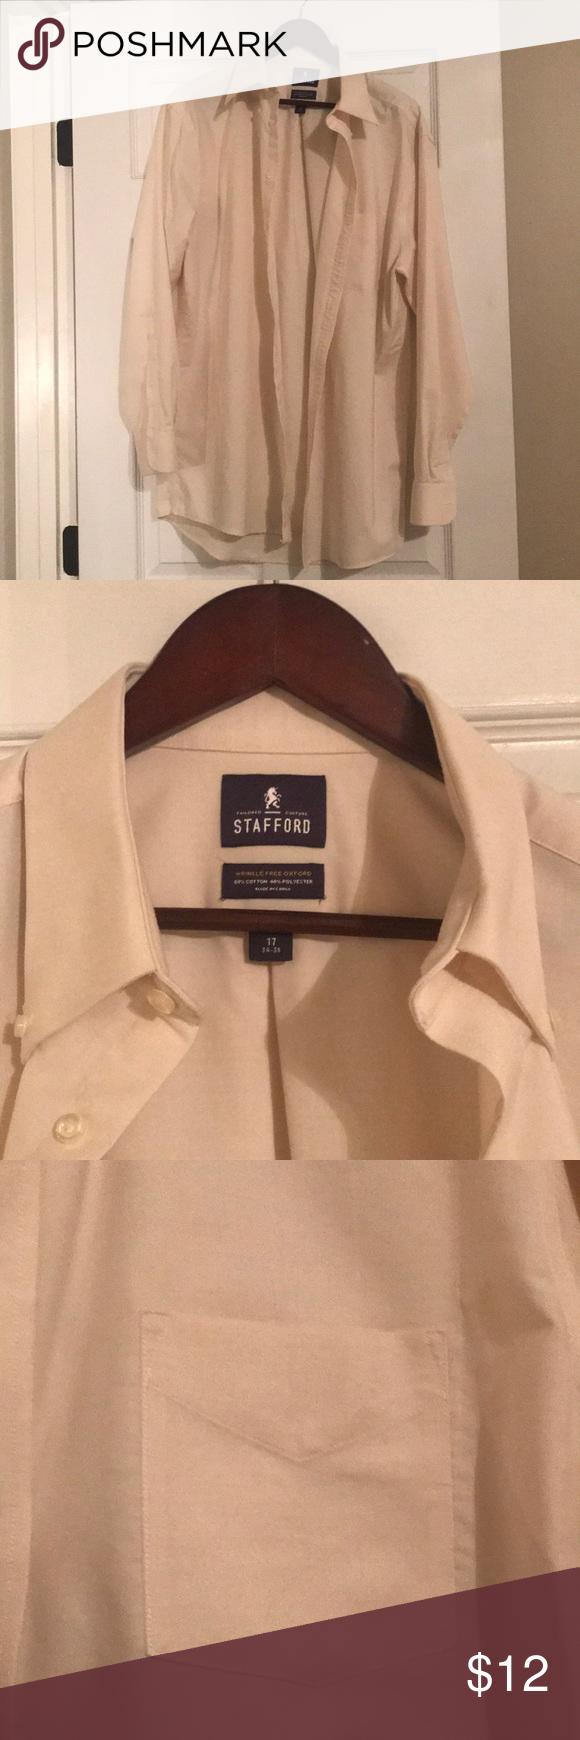 Stanford Dress Shirt My Posh Picks